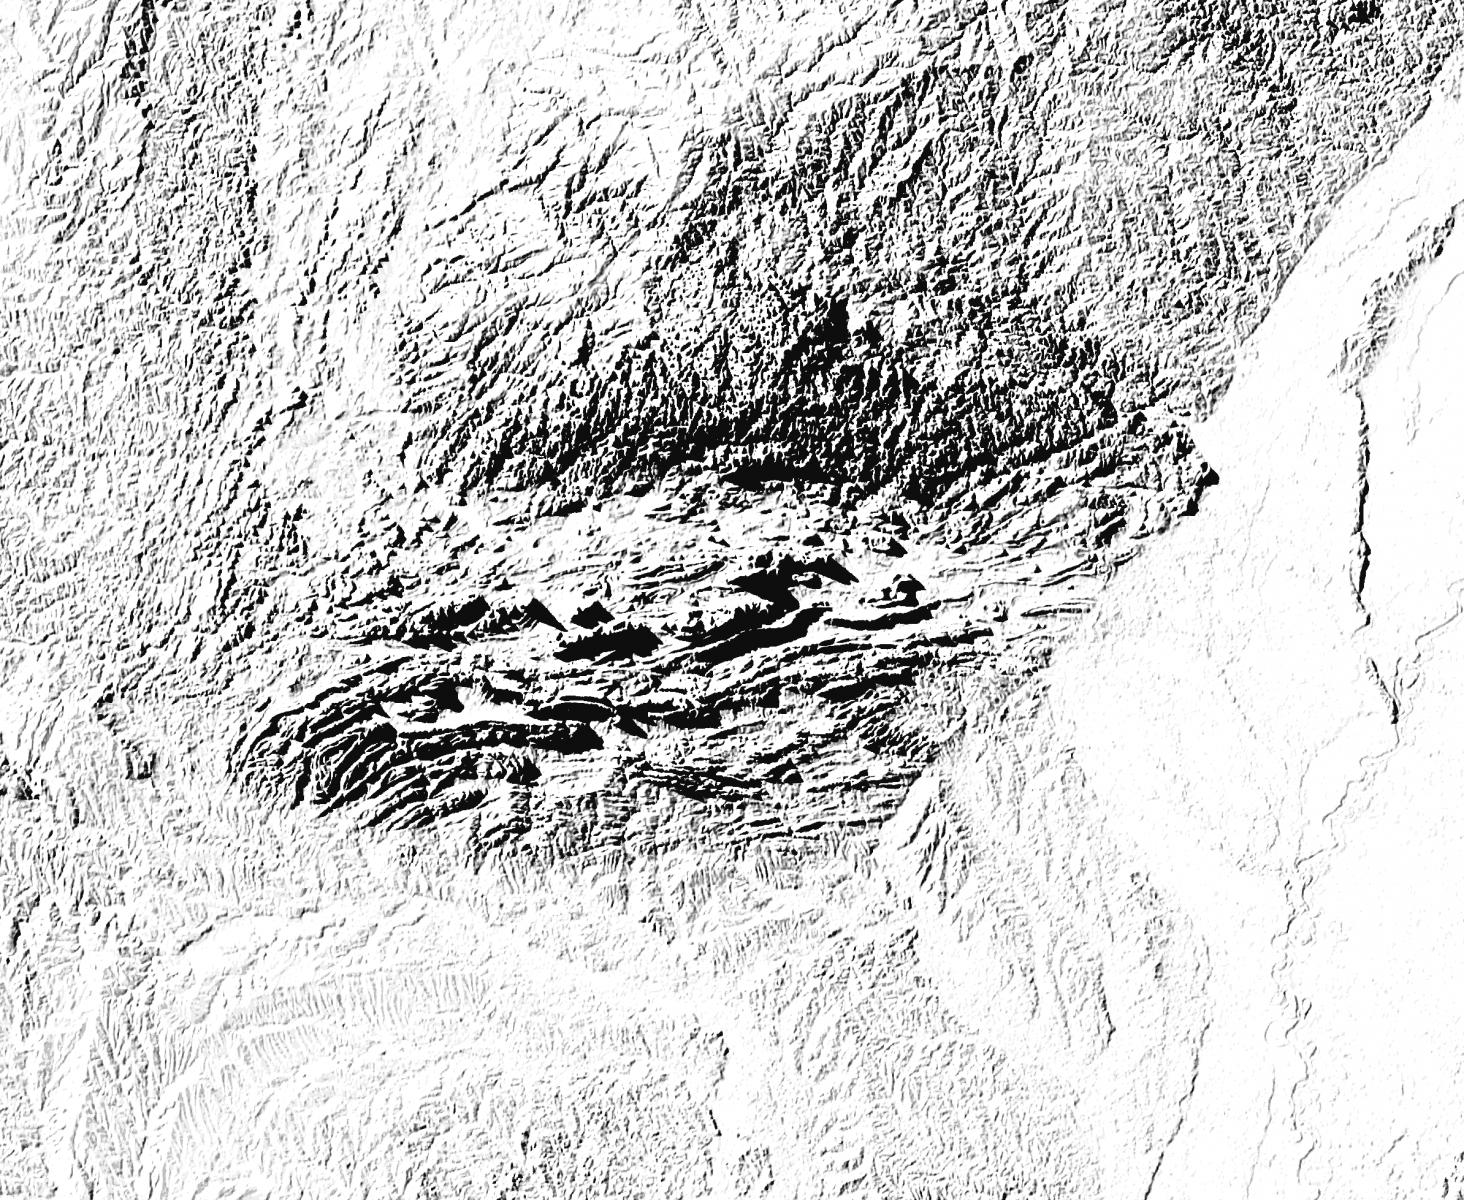 carte-usa-couchers-soleil-02